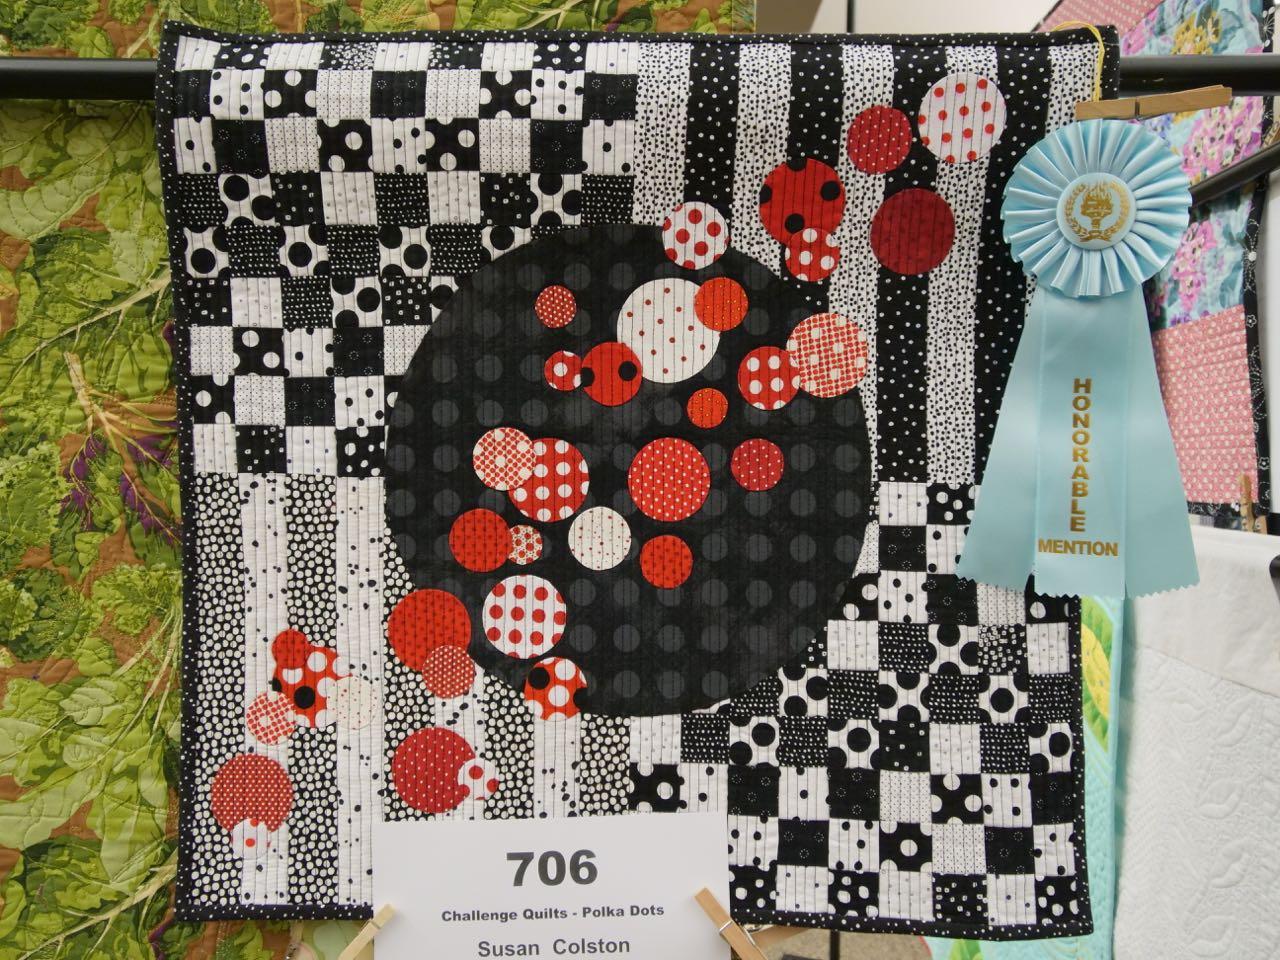 Checks! Stripes! Polka Dots! Oh My! - Honorable Mention, Polka Dot Challenge